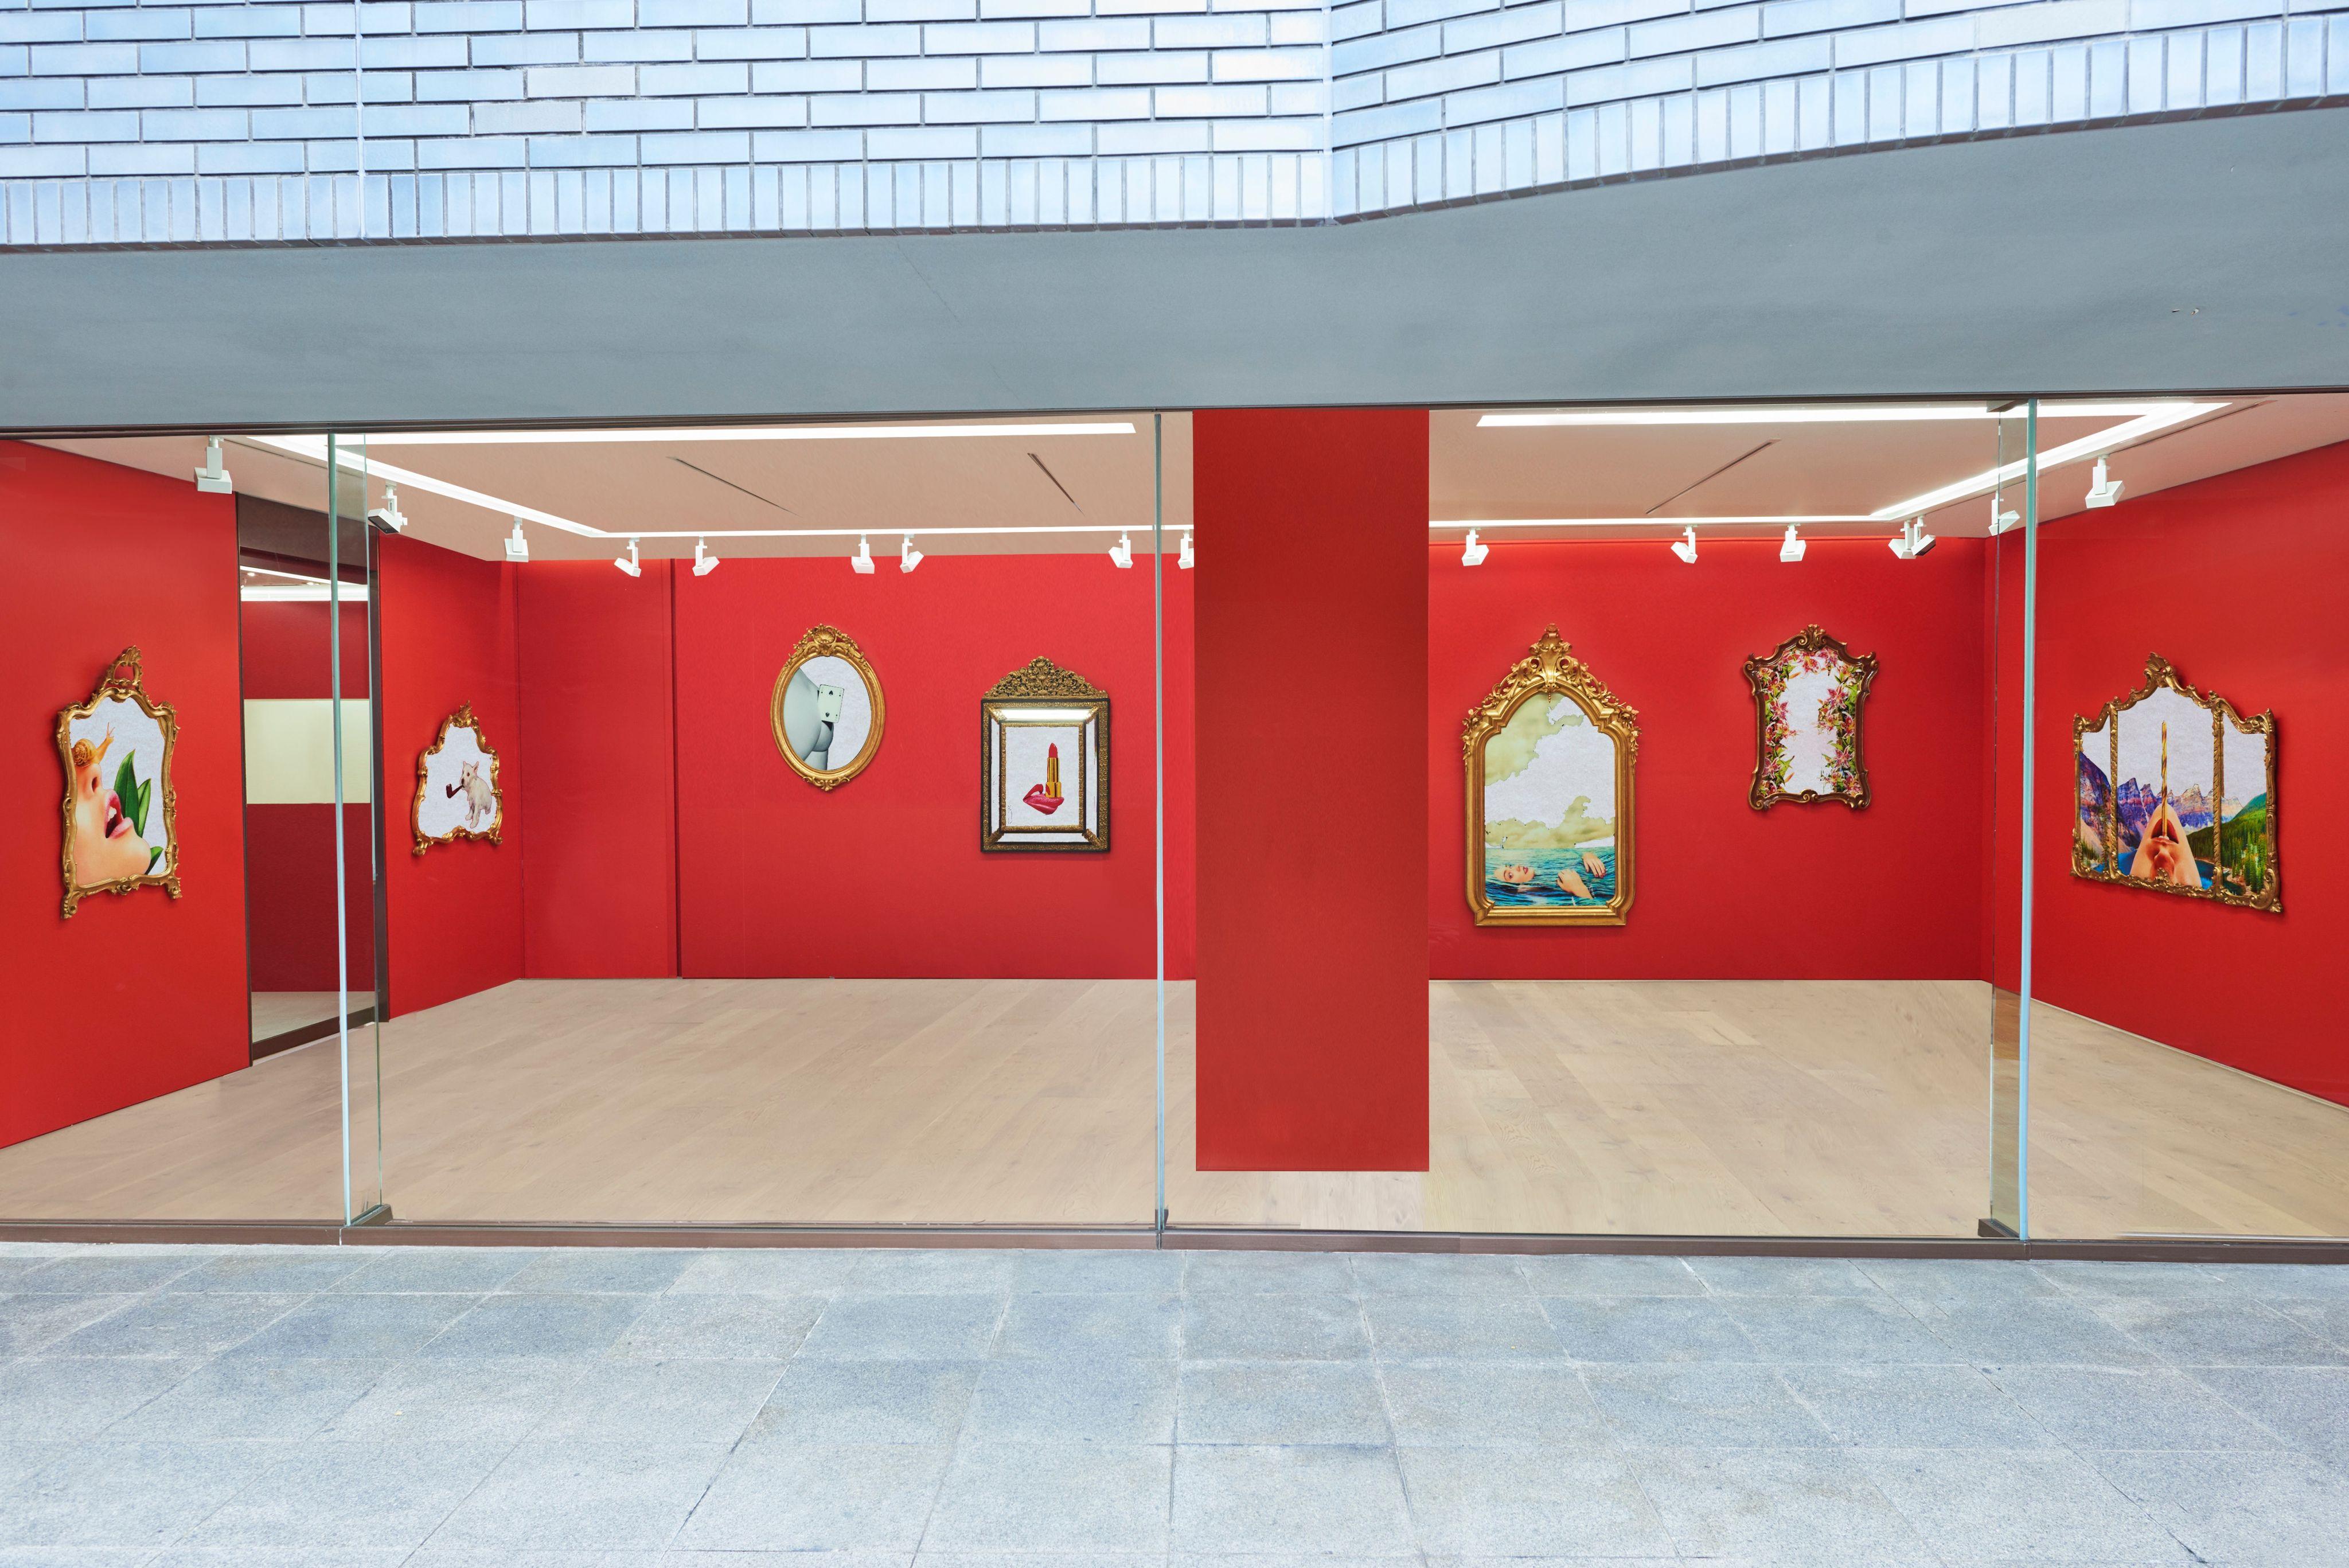 Artist:TOILET PAPER: Collaboration Maurizio Cattelan / Pierpaolo Ferrari, Exhibition: